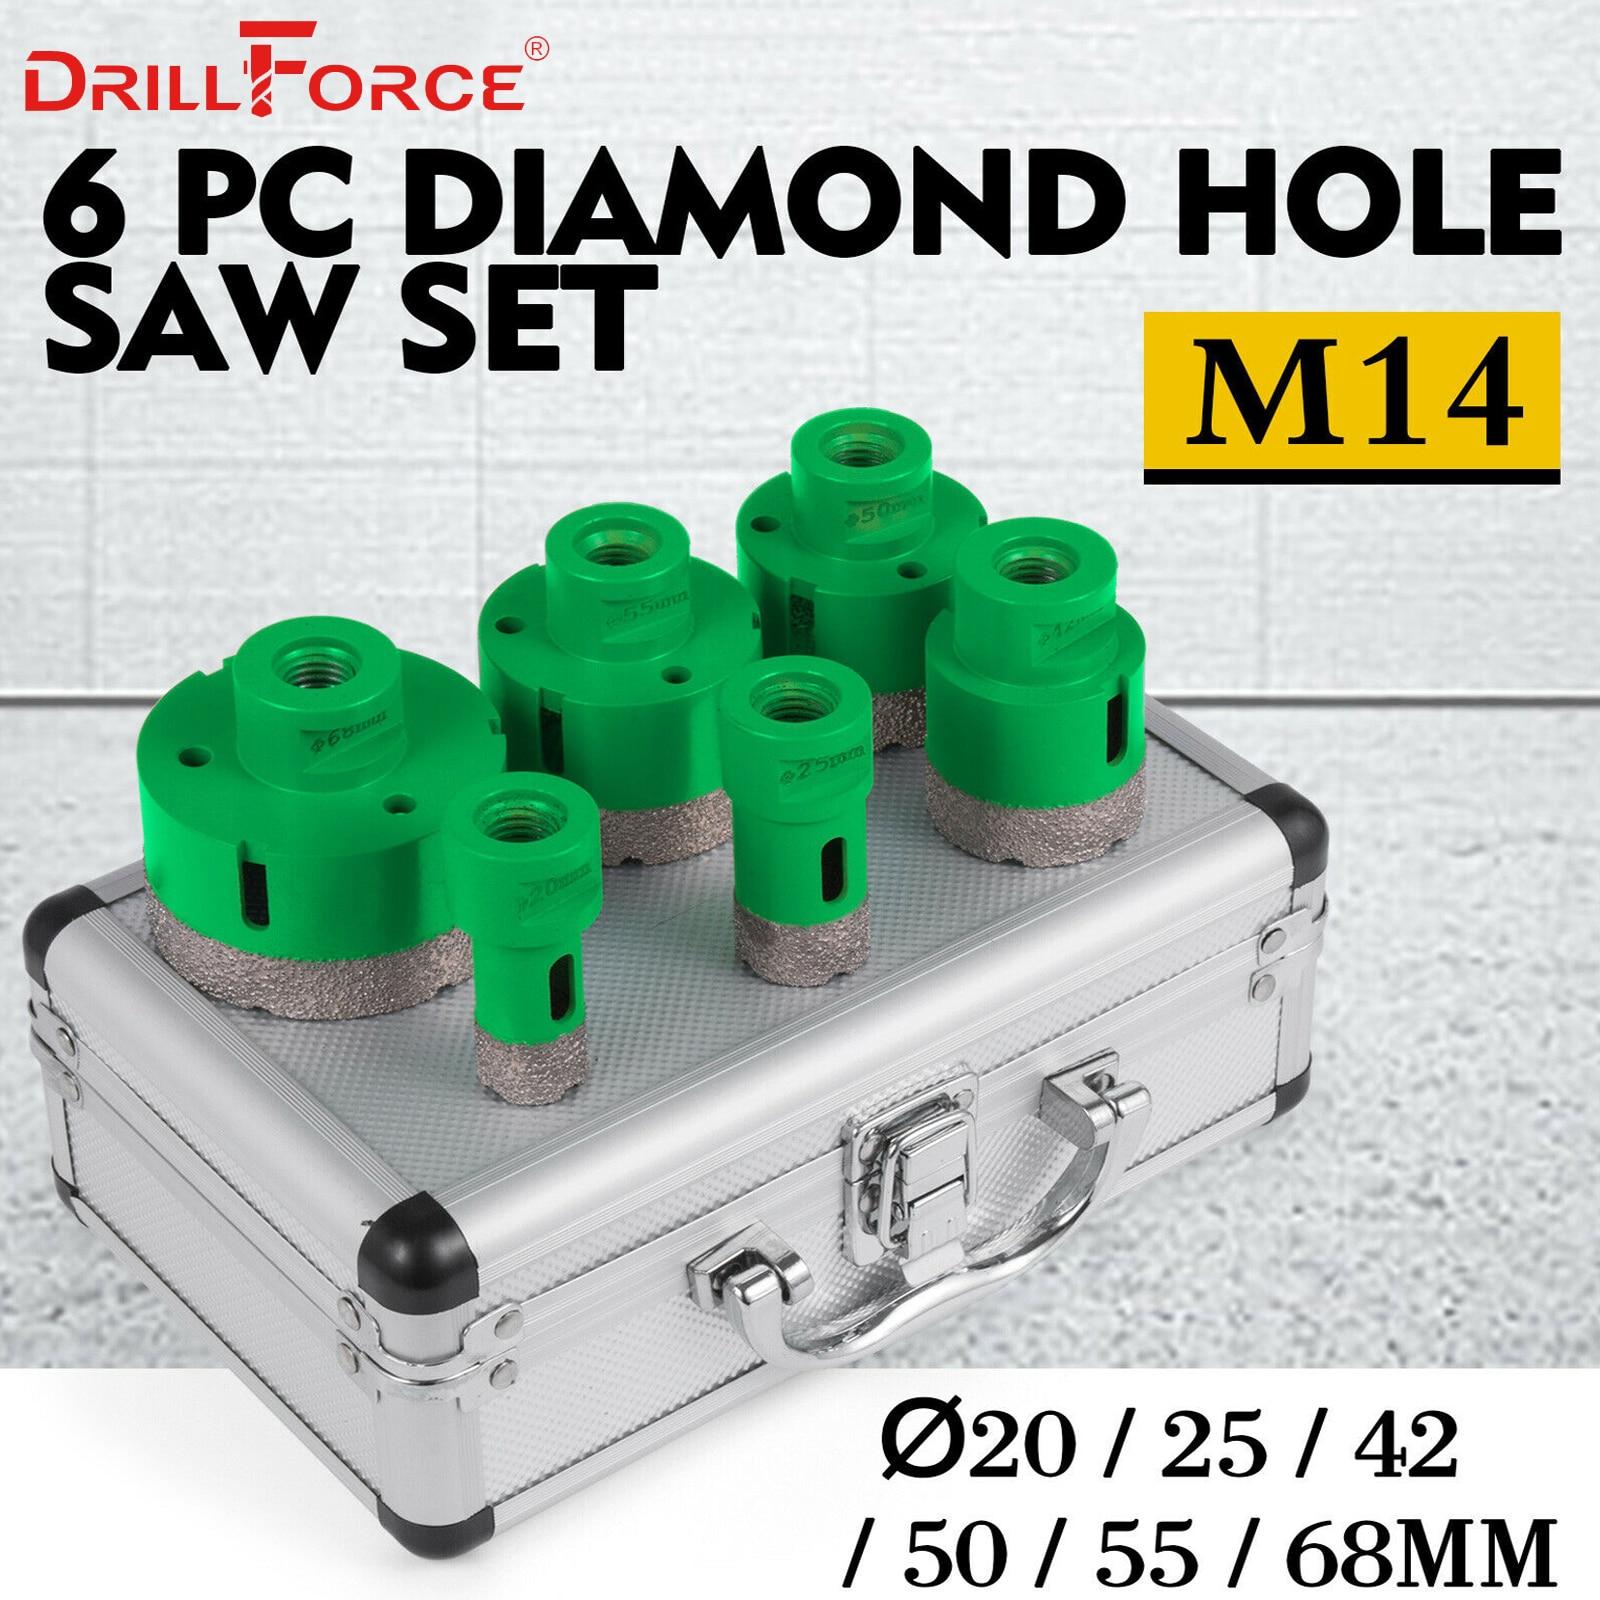 Drillforce 6 piezas de agujero sierras de 20/25/42/50/55/68mm M14 durable Carborundum cerámica M14 hilo Taladro de núcleo